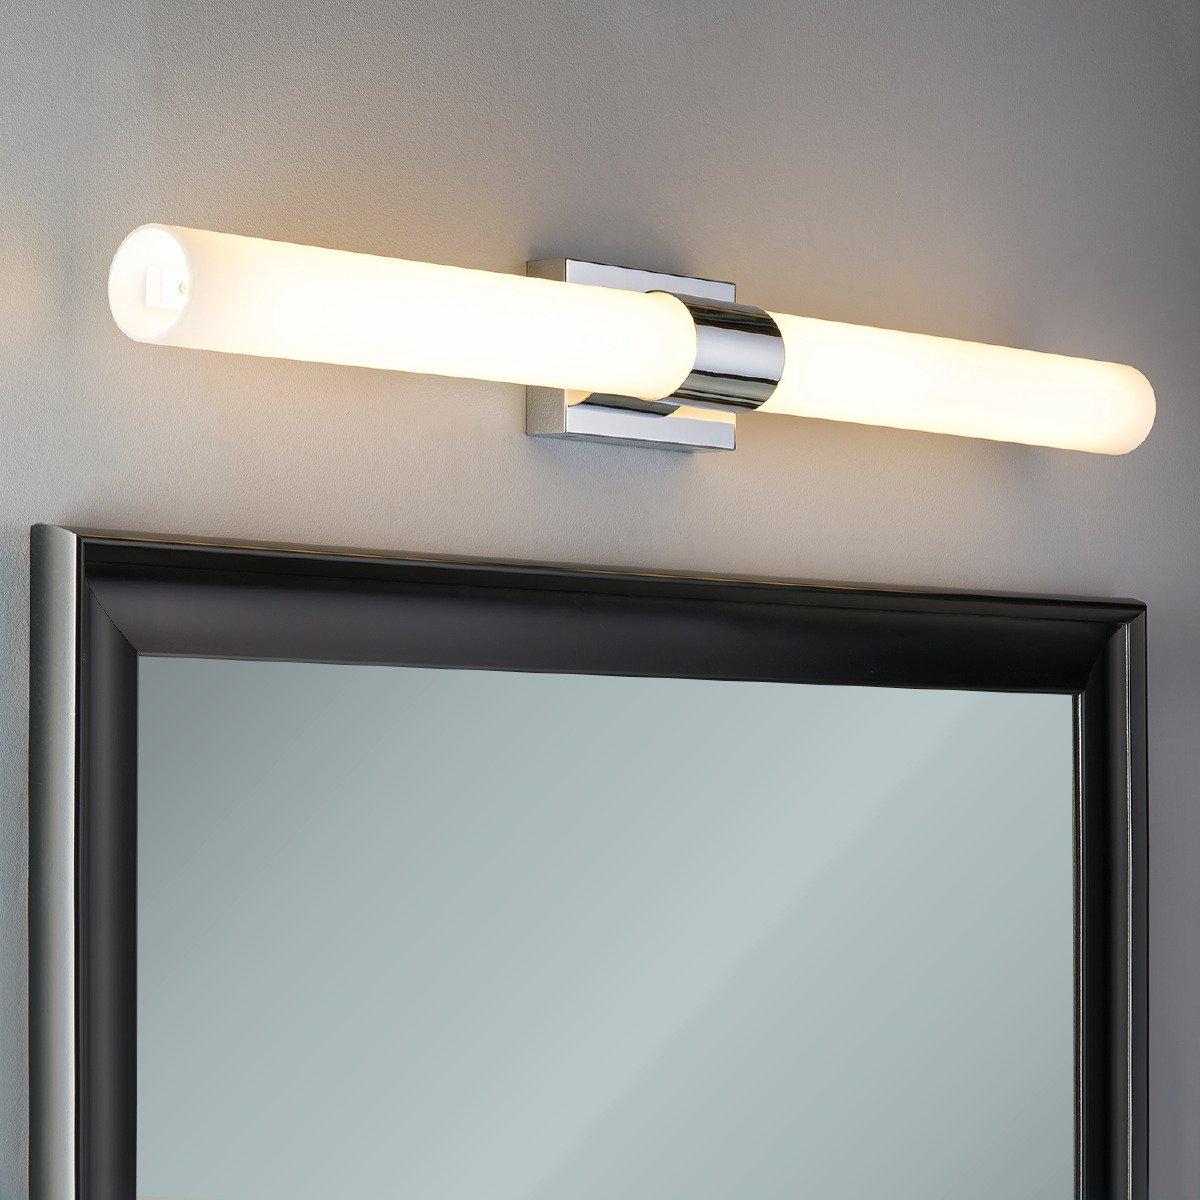 Perpetua 42 Inch Led Bathroom Vanity Light Chrome Linea Di Liara Basement Wiring Diagram Before Installing The Ll Sc944 Pc